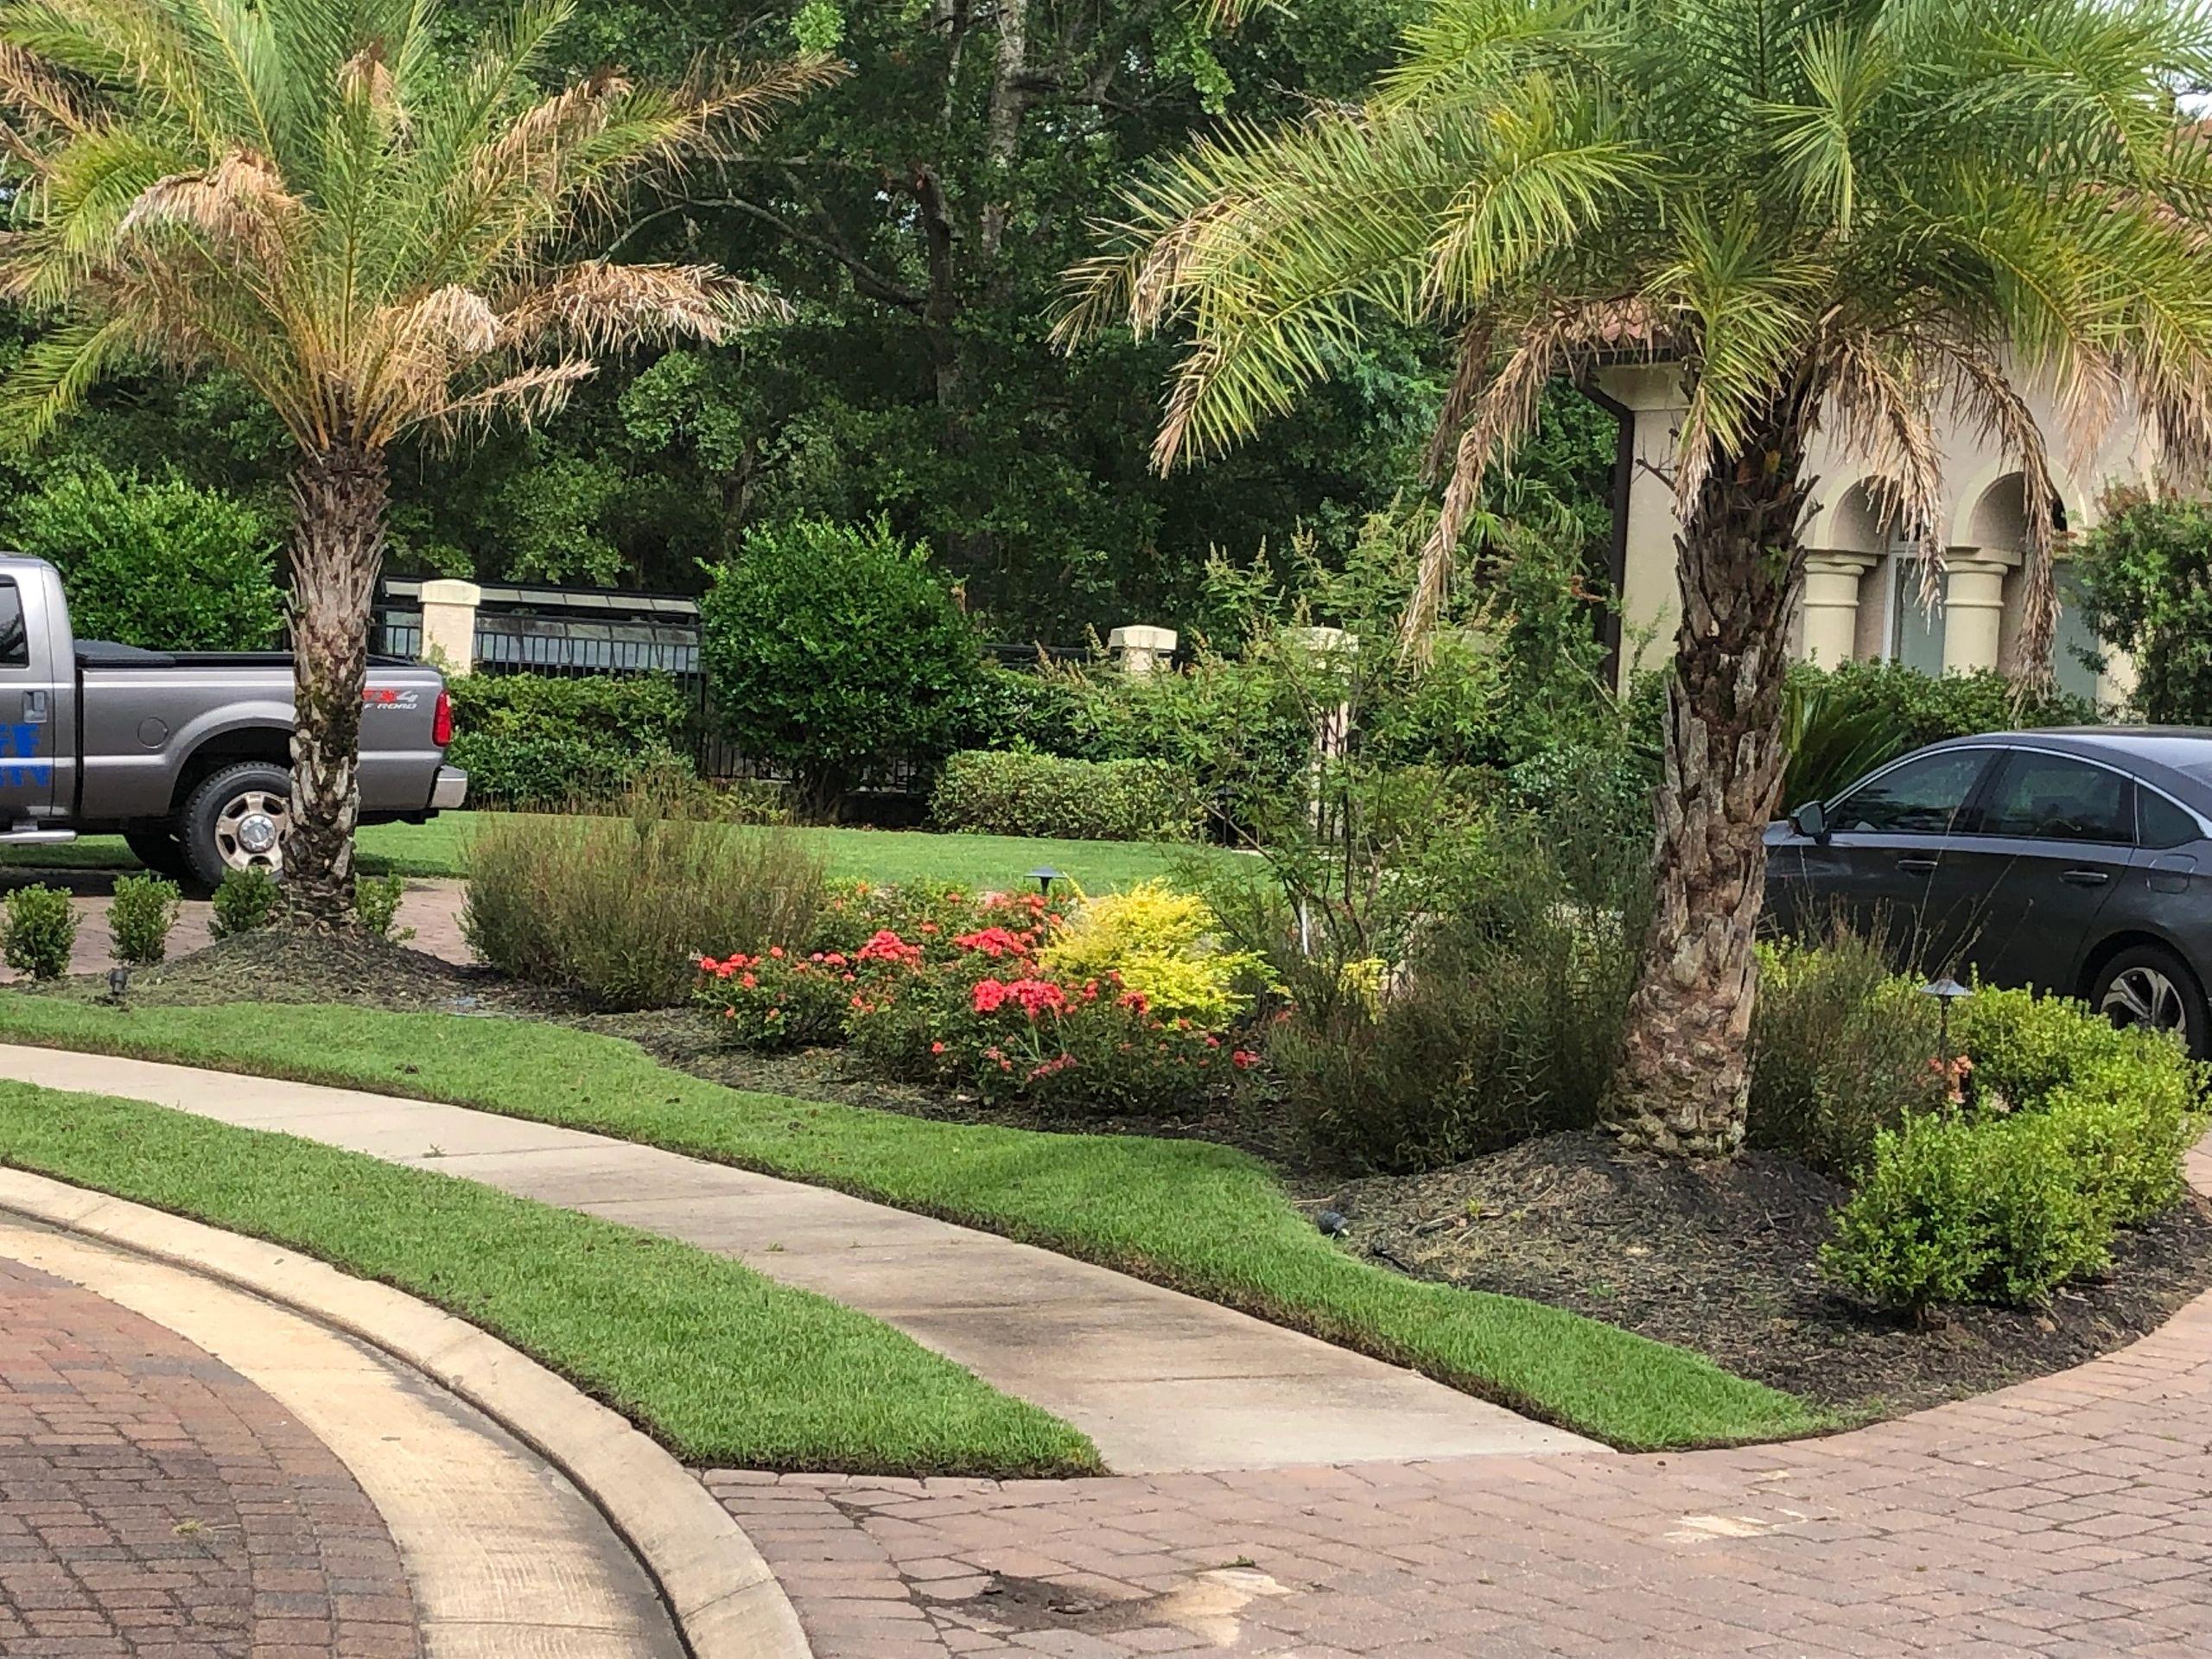 Pro Cuts Usa Lawn Service Llc Lawn Service Lawn Care Lawn Mowing